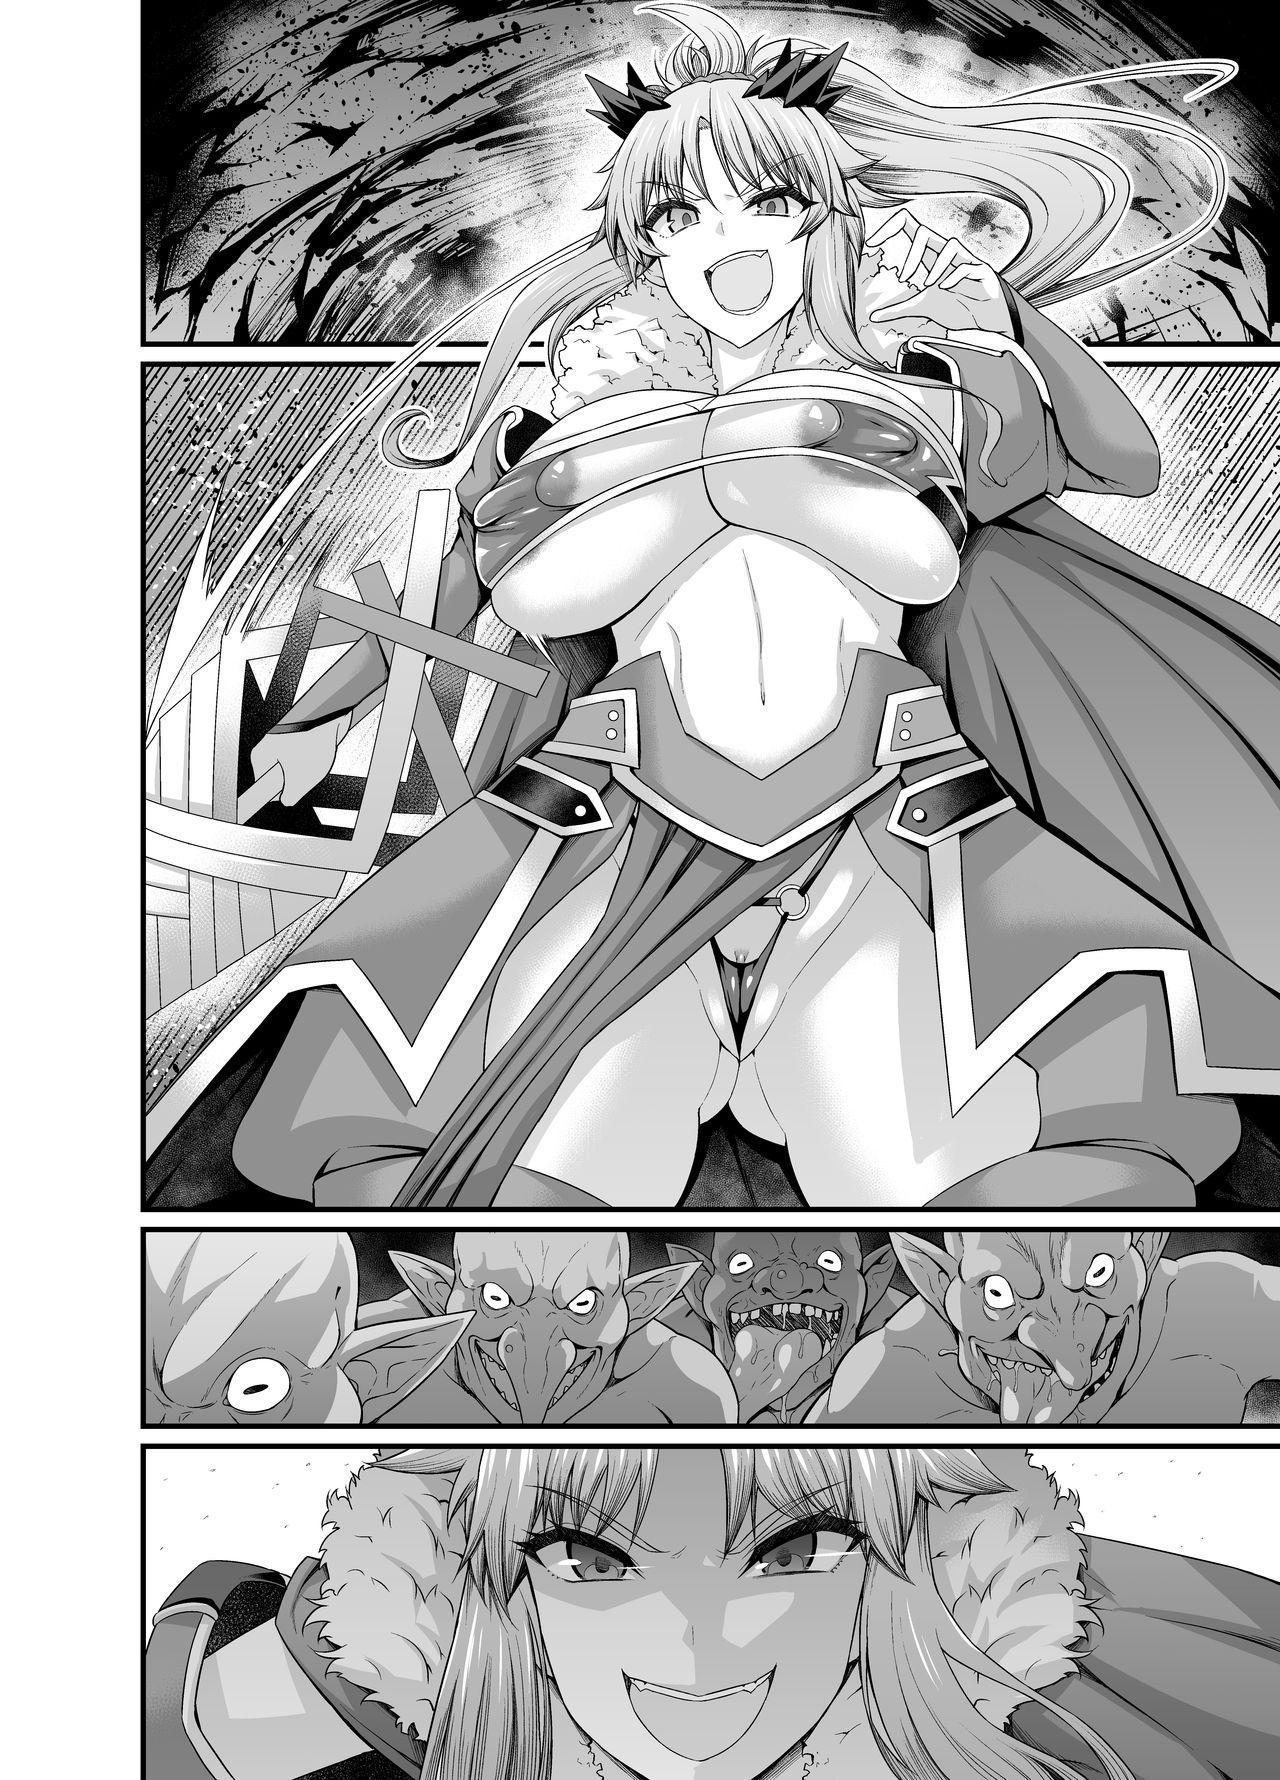 Bakunyū Ransāmōdoreddo vs Goburin 4